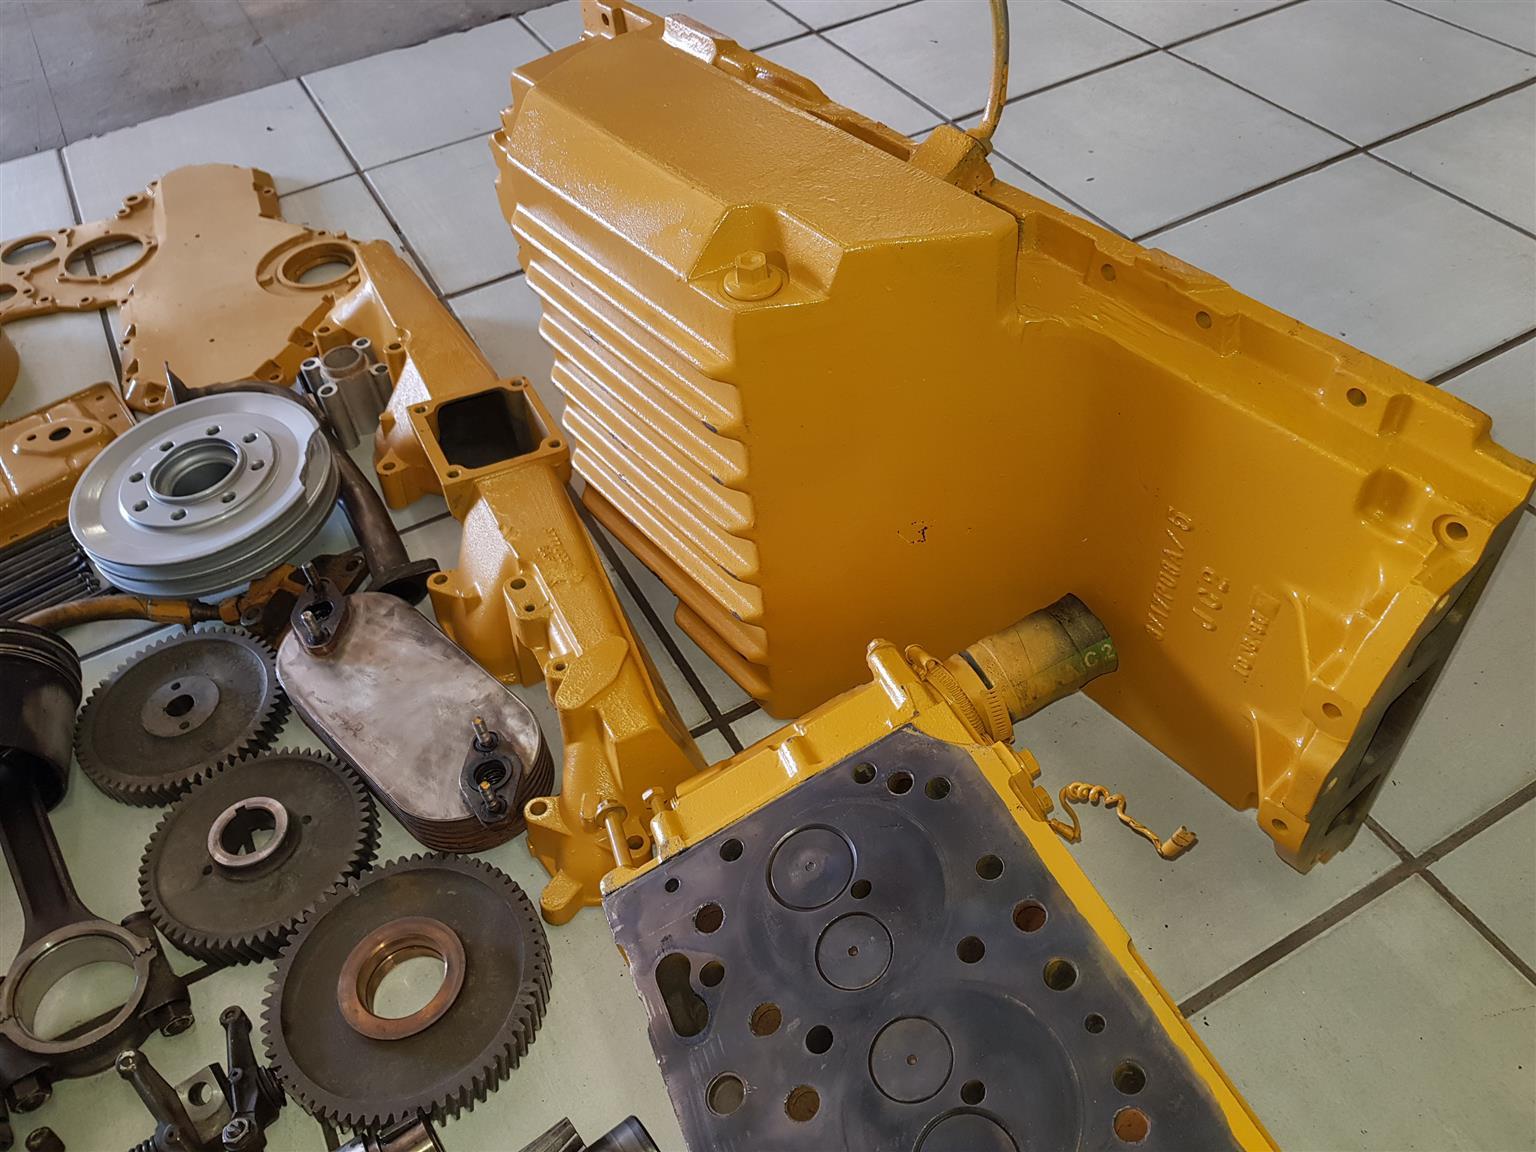 Perkins 1006 Caterpillar 3056 Engine For Spares Junk Mail